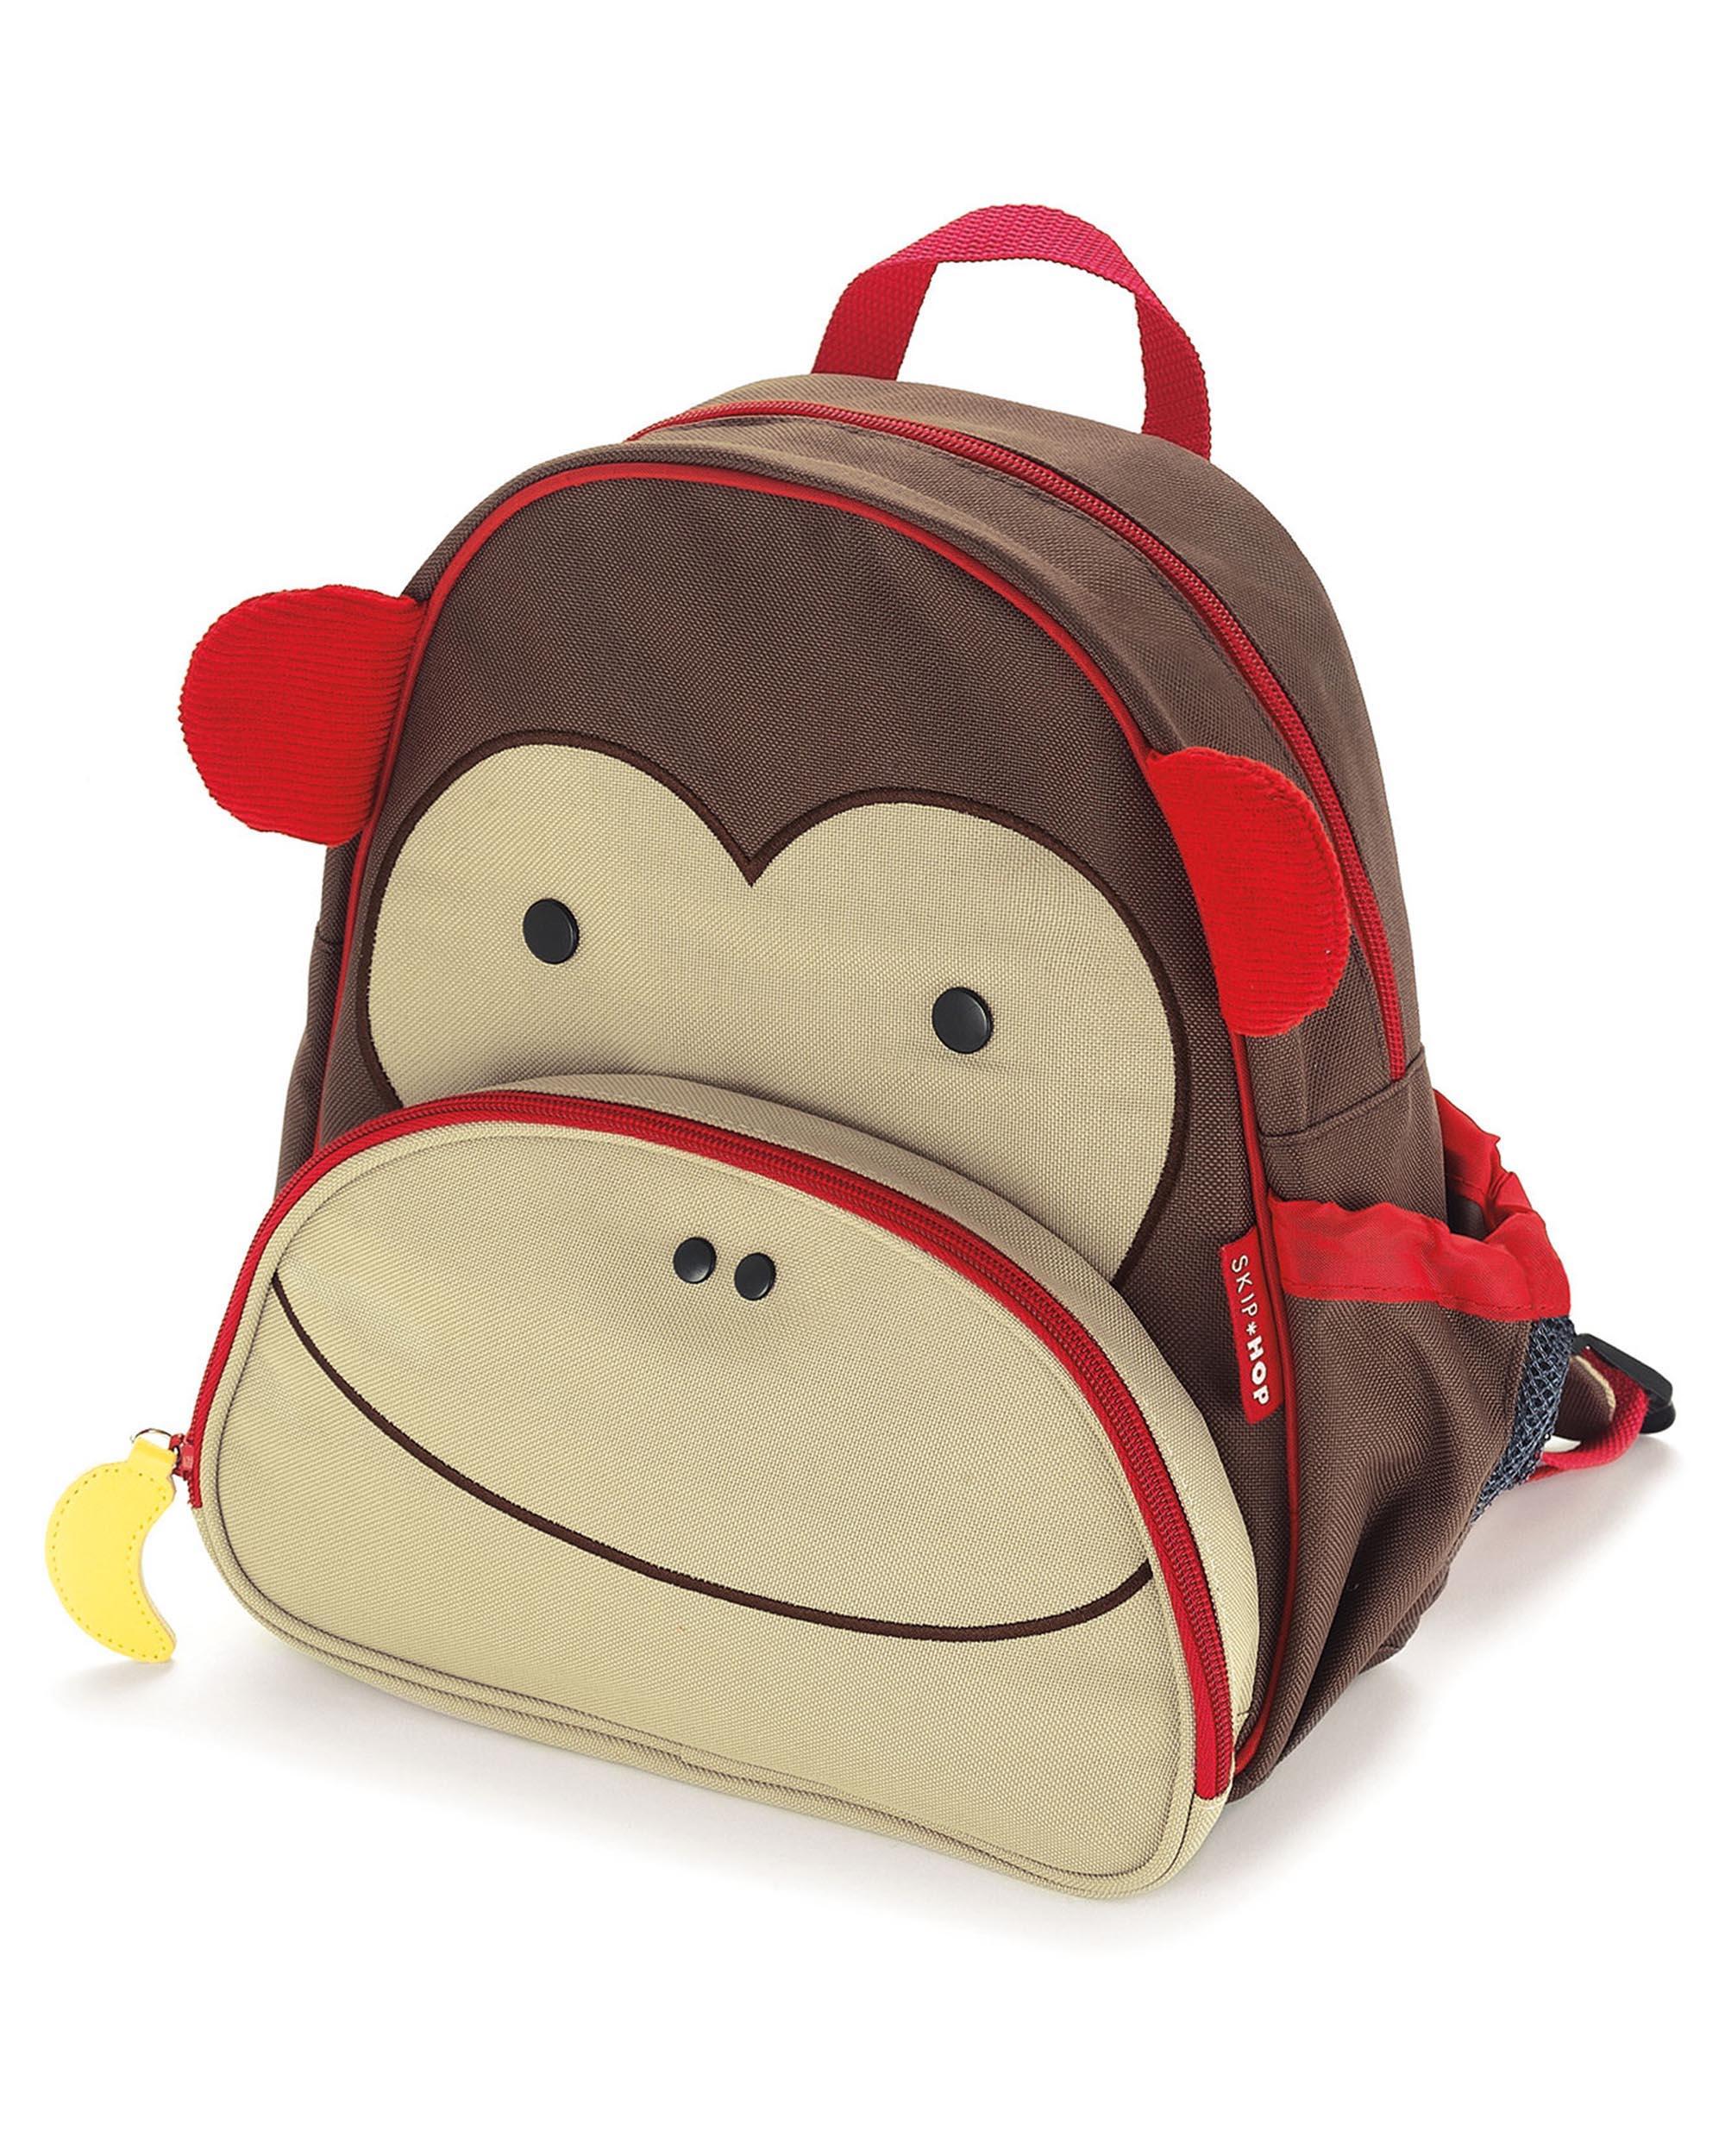 74b0166e8f68 Zoo Little Kid Backpack | skiphop.com